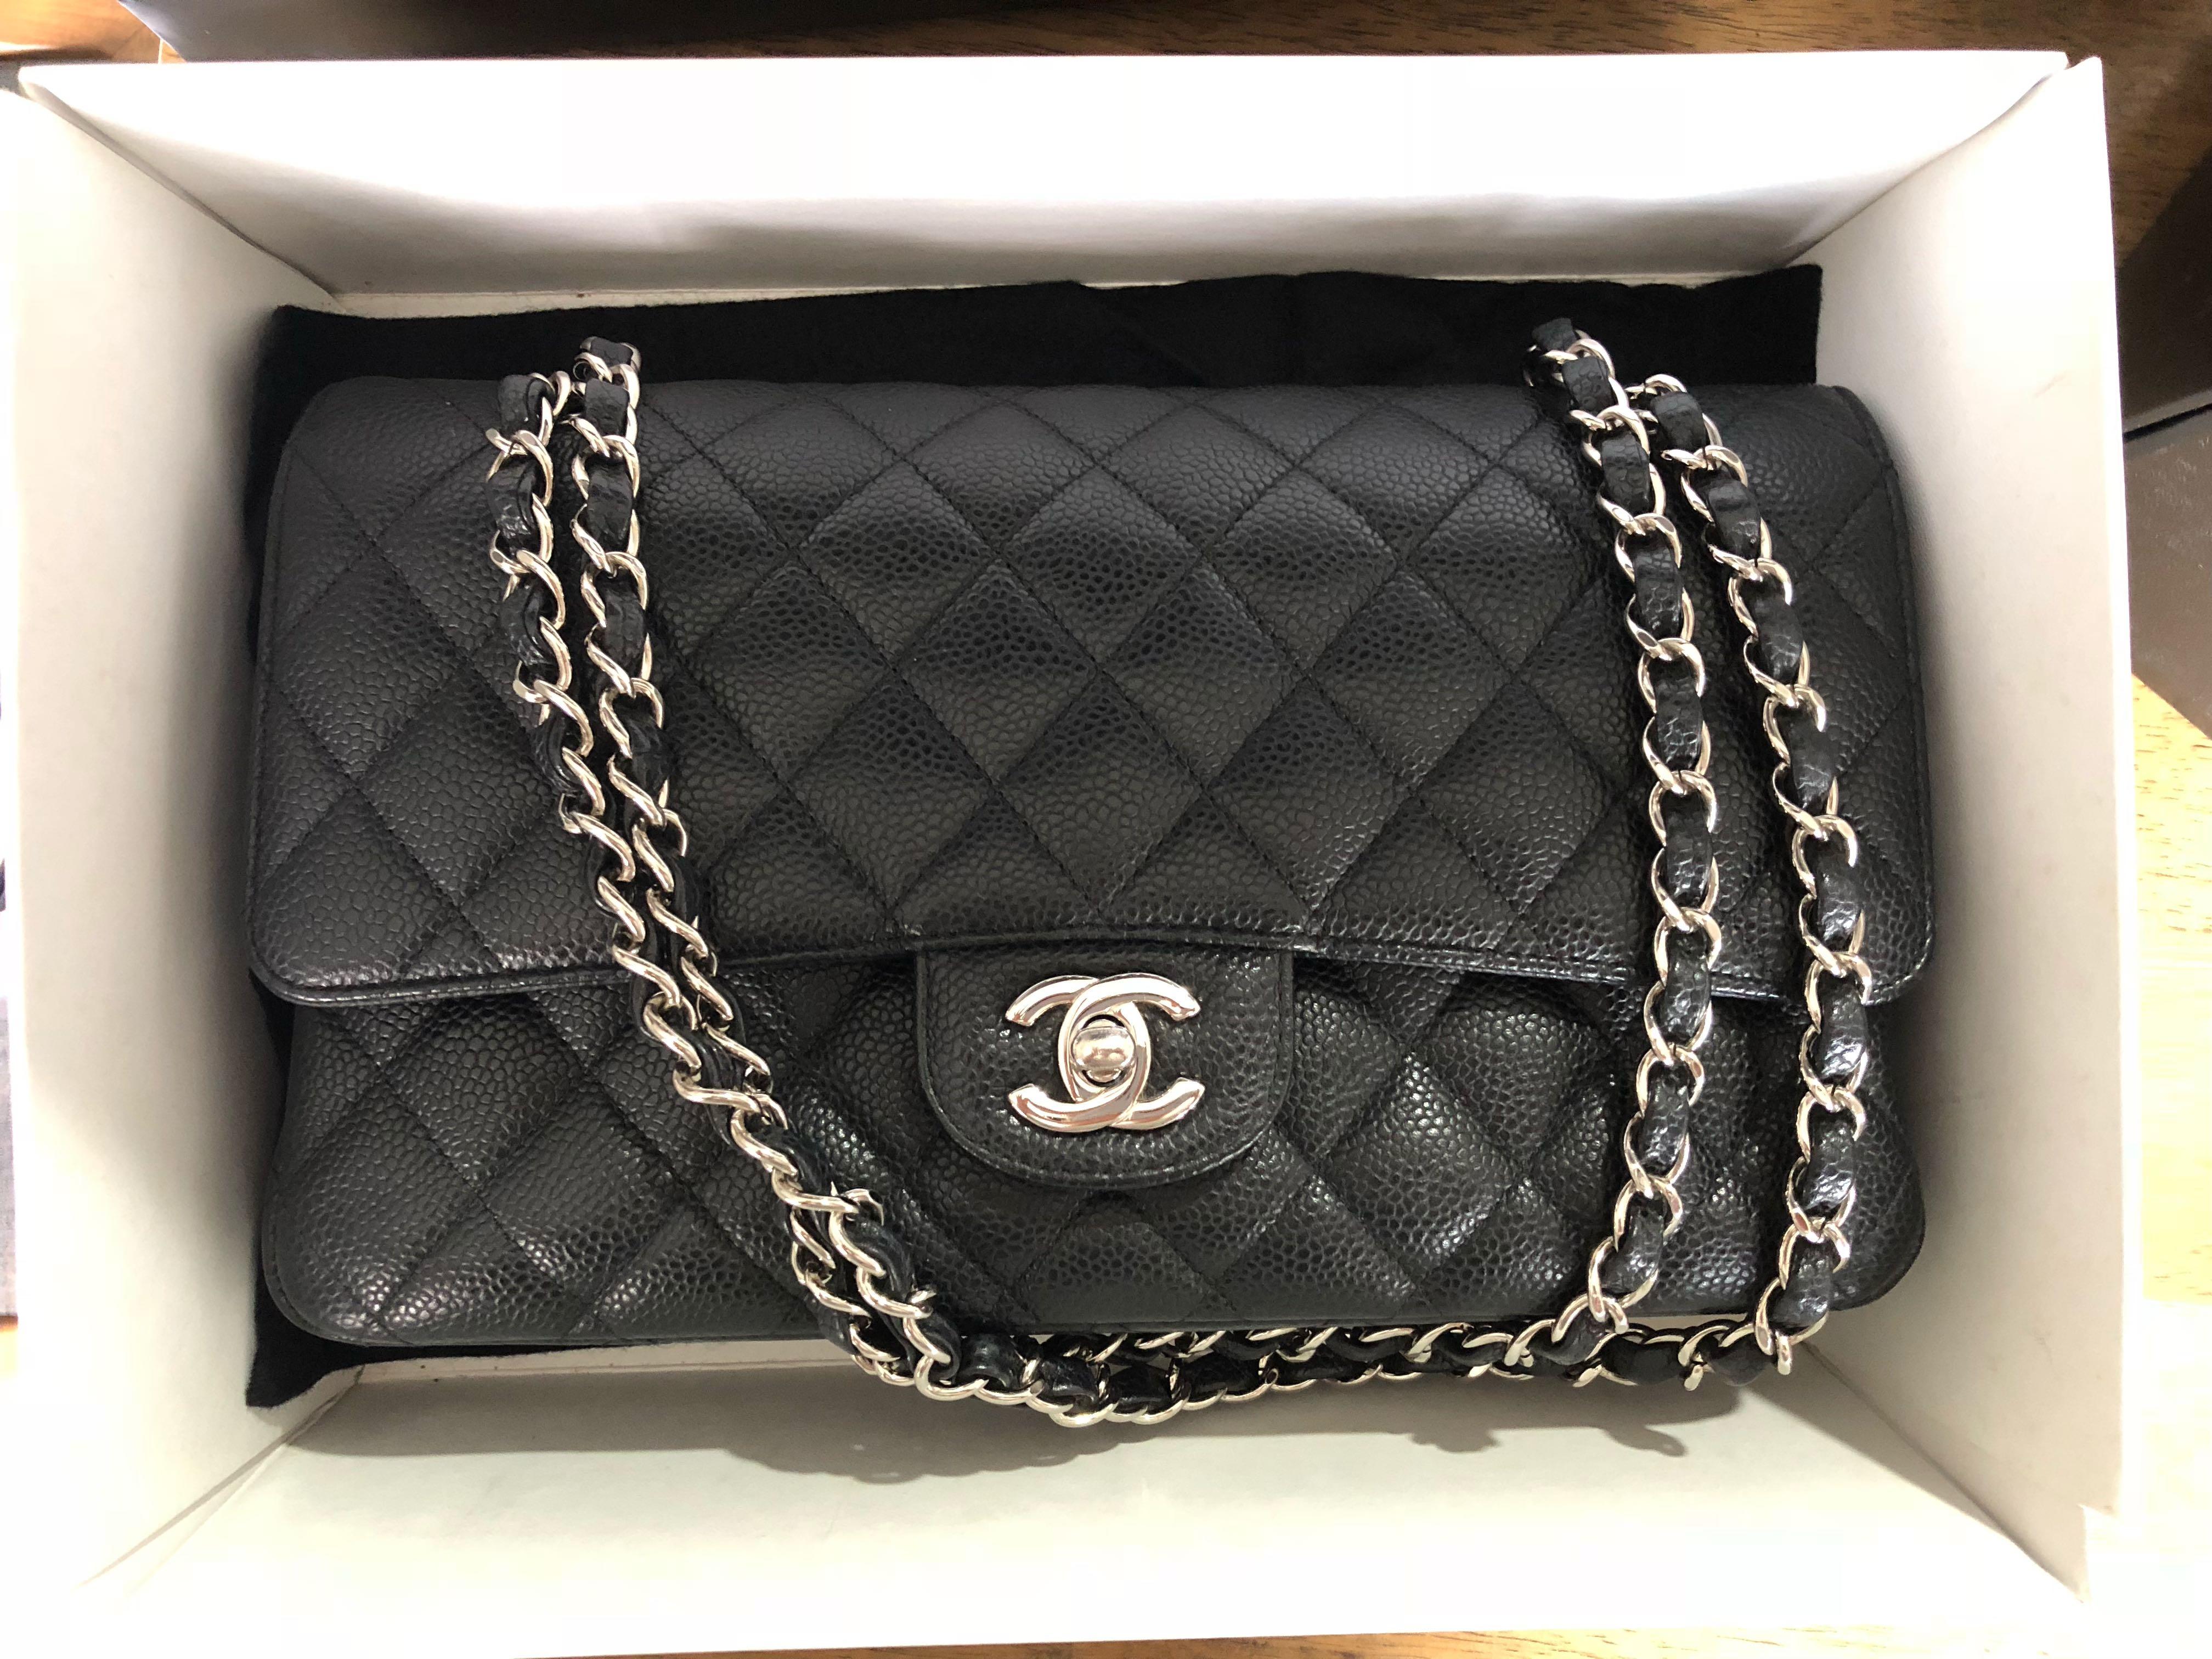 8c5bec68ffe2 Chanel classic caviar medium size SHW, Luxury, Bags & Wallets ...